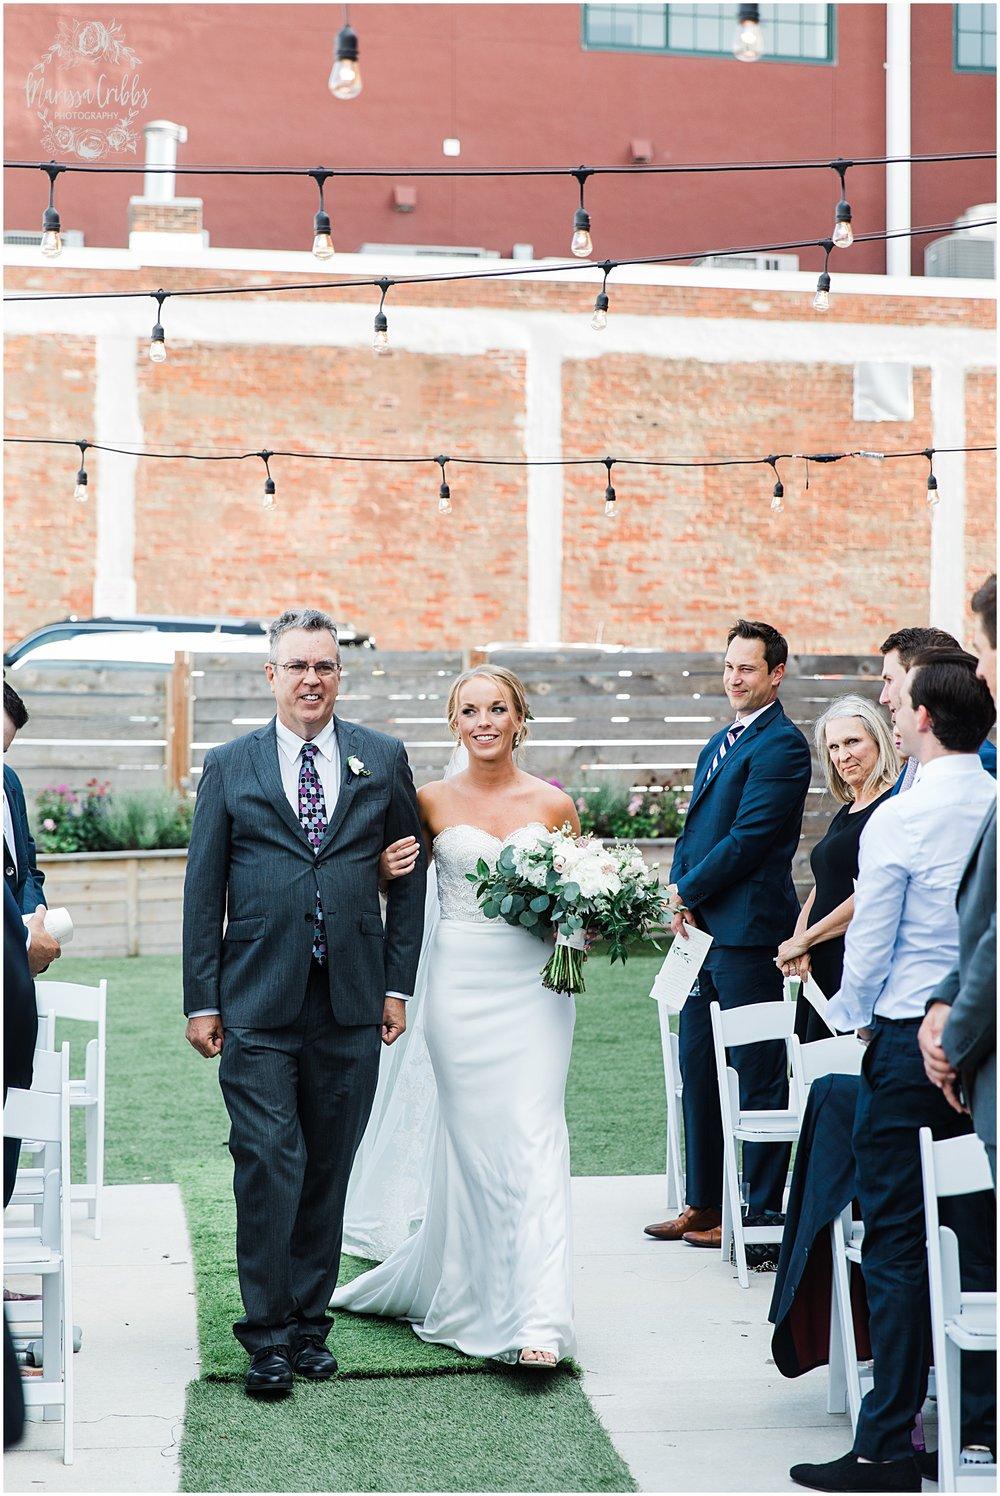 MAGNOLIA VENUE WEDDING | CHARLIE & NATALIE | MARISSA CRIBBS PHOTOGRAPHY_5754.jpg